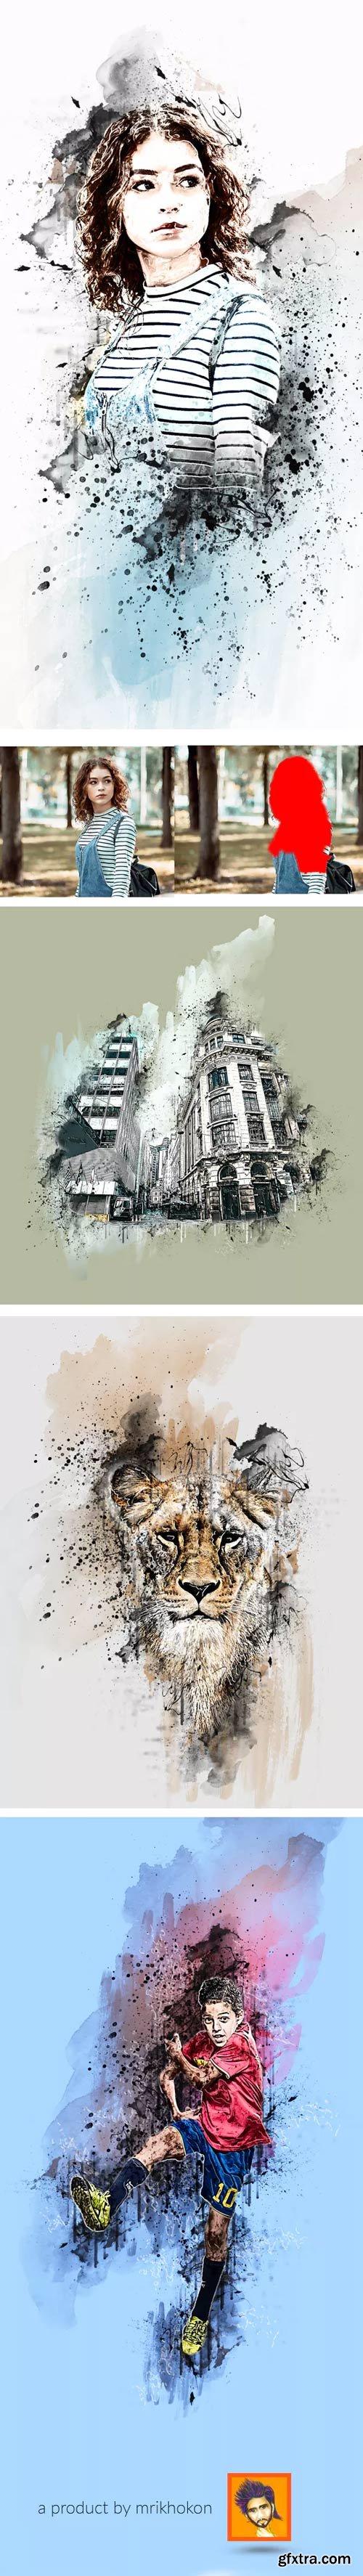 GraphicRiver - Ink Manipulation Photoshop Action - 23025536